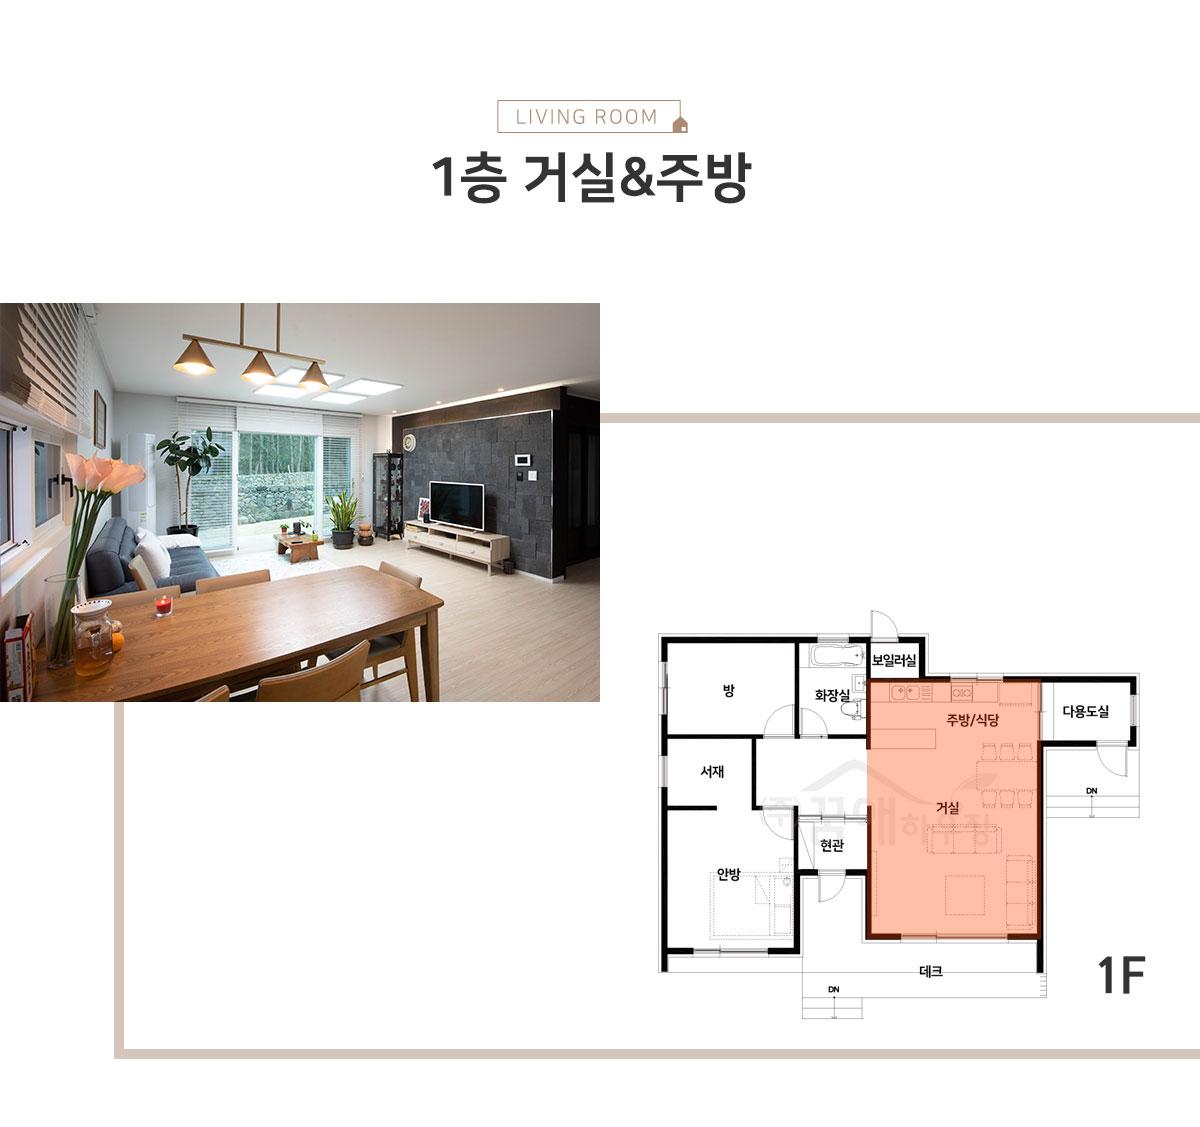 003_living-room_제주_선흘리_지00_01.jpg